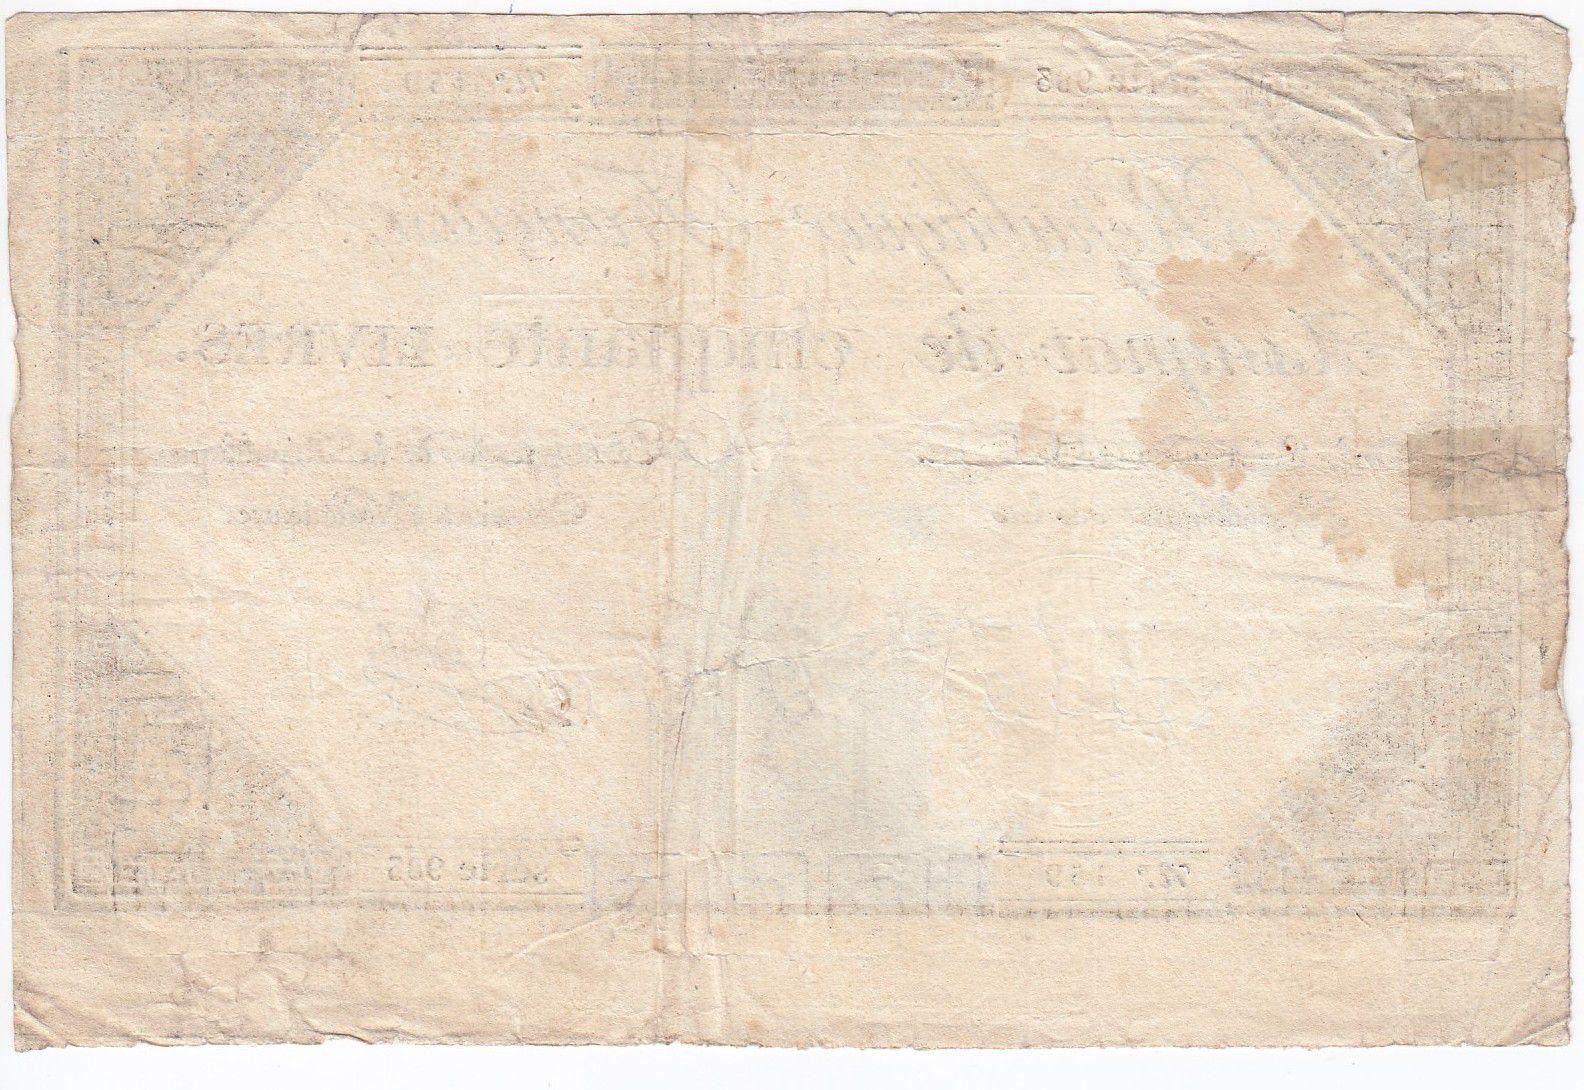 France 50 Livres France assise - 14-12-1792 - Sign. Jacob - TB+